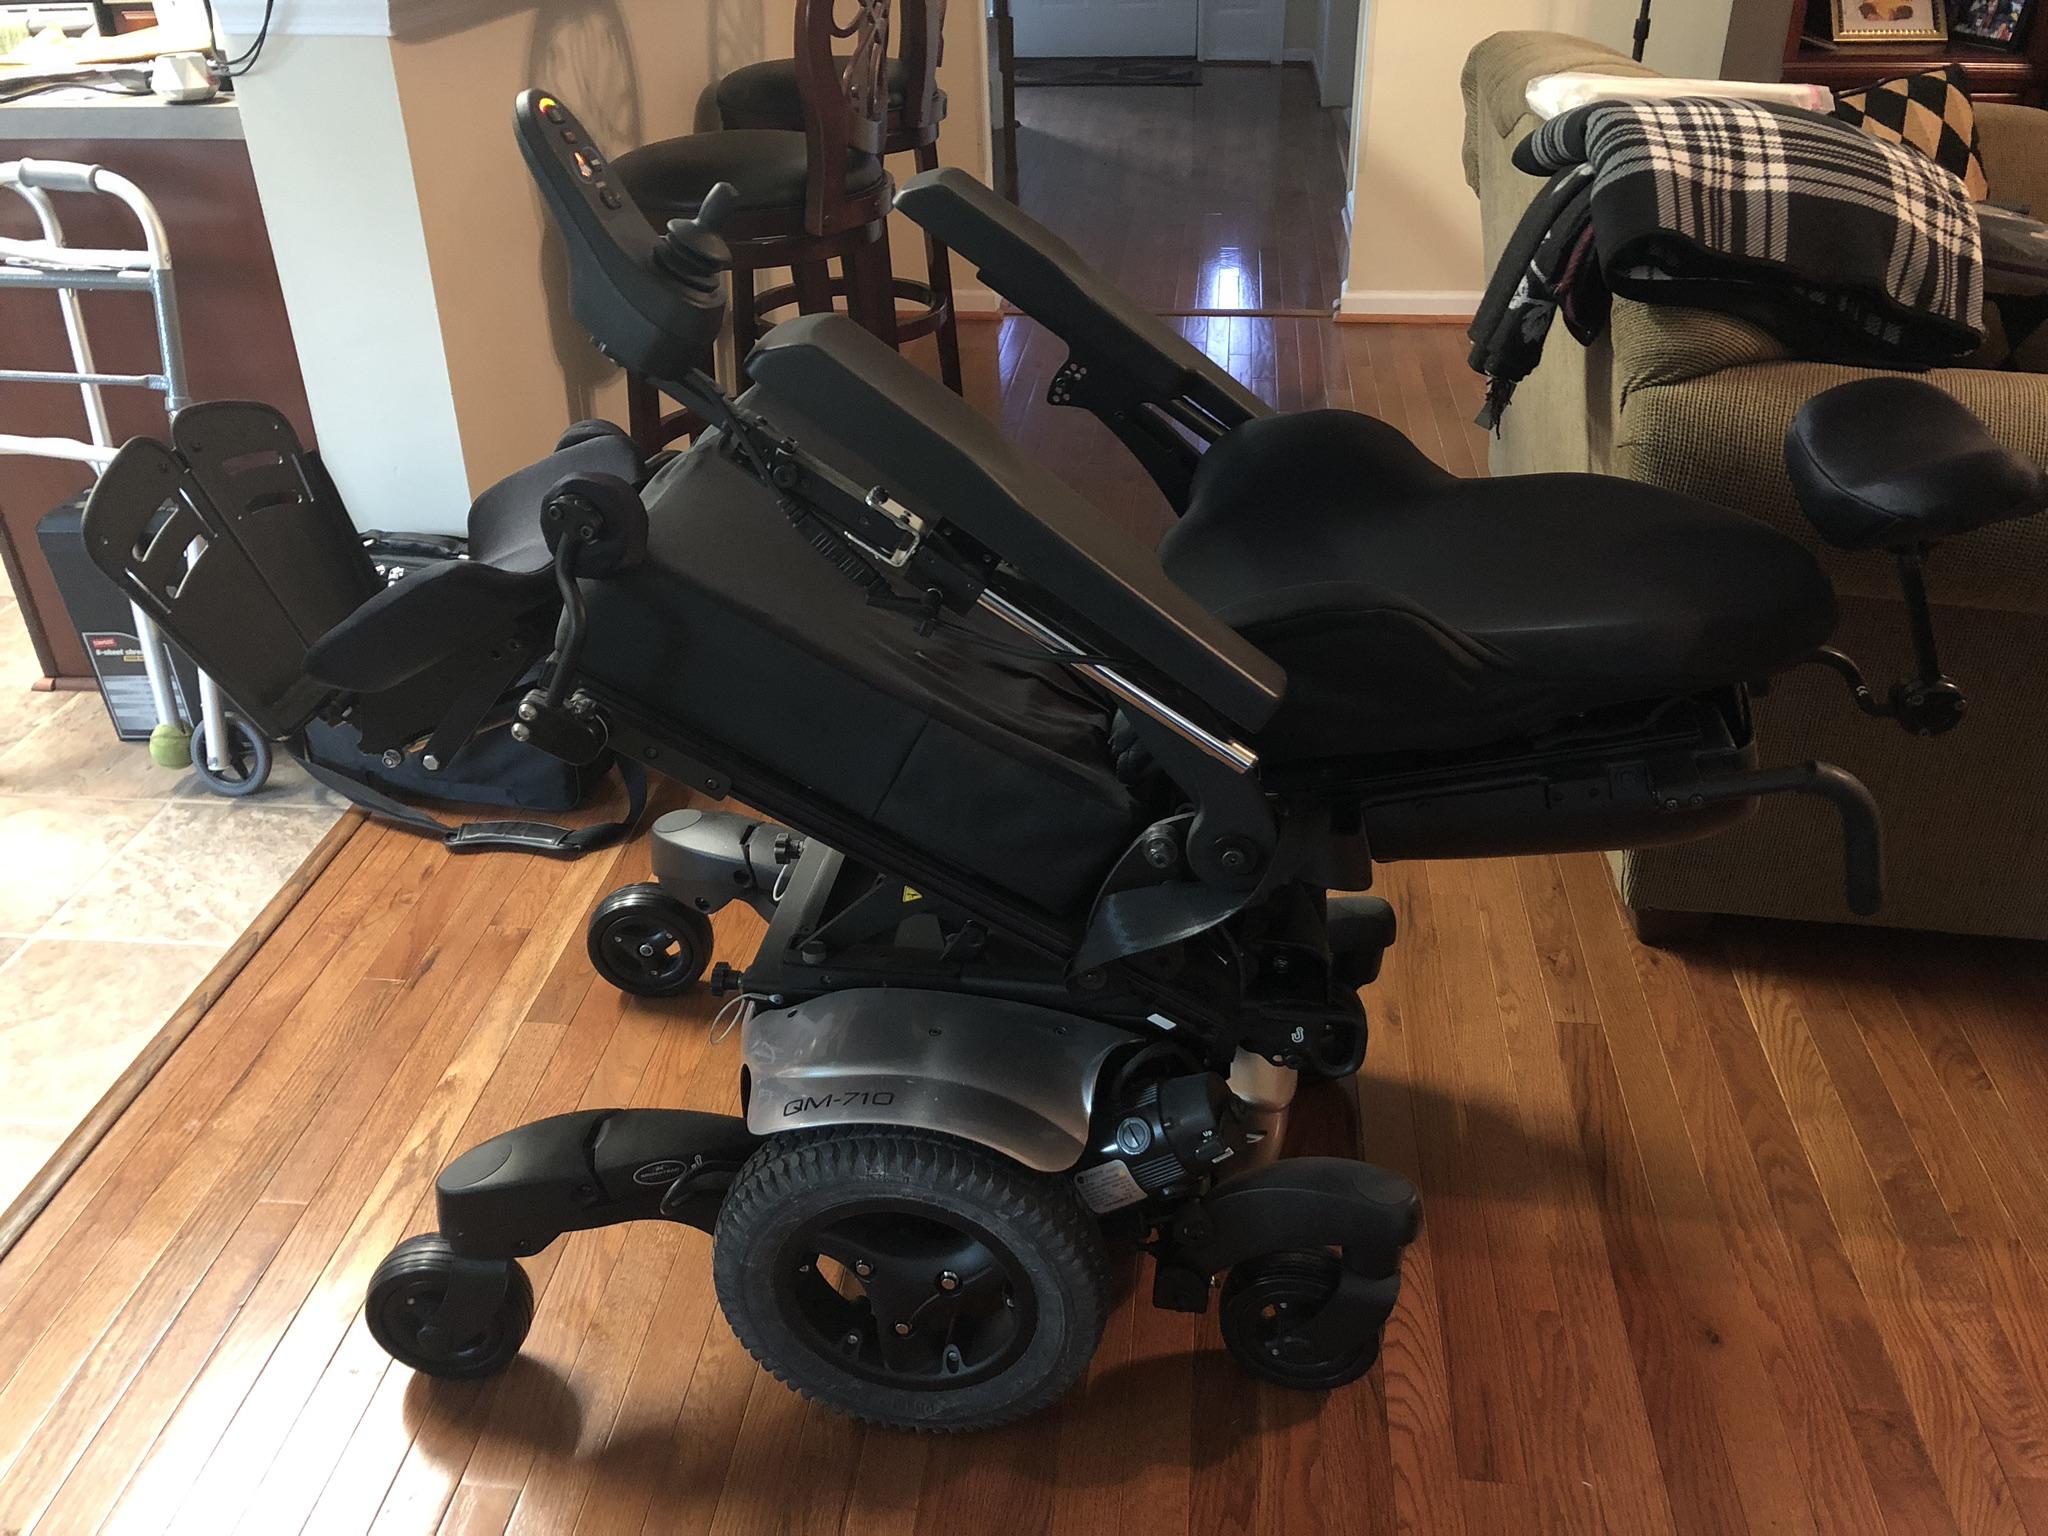 Photo 4 of Quickie QM-710 Power Wheelchair